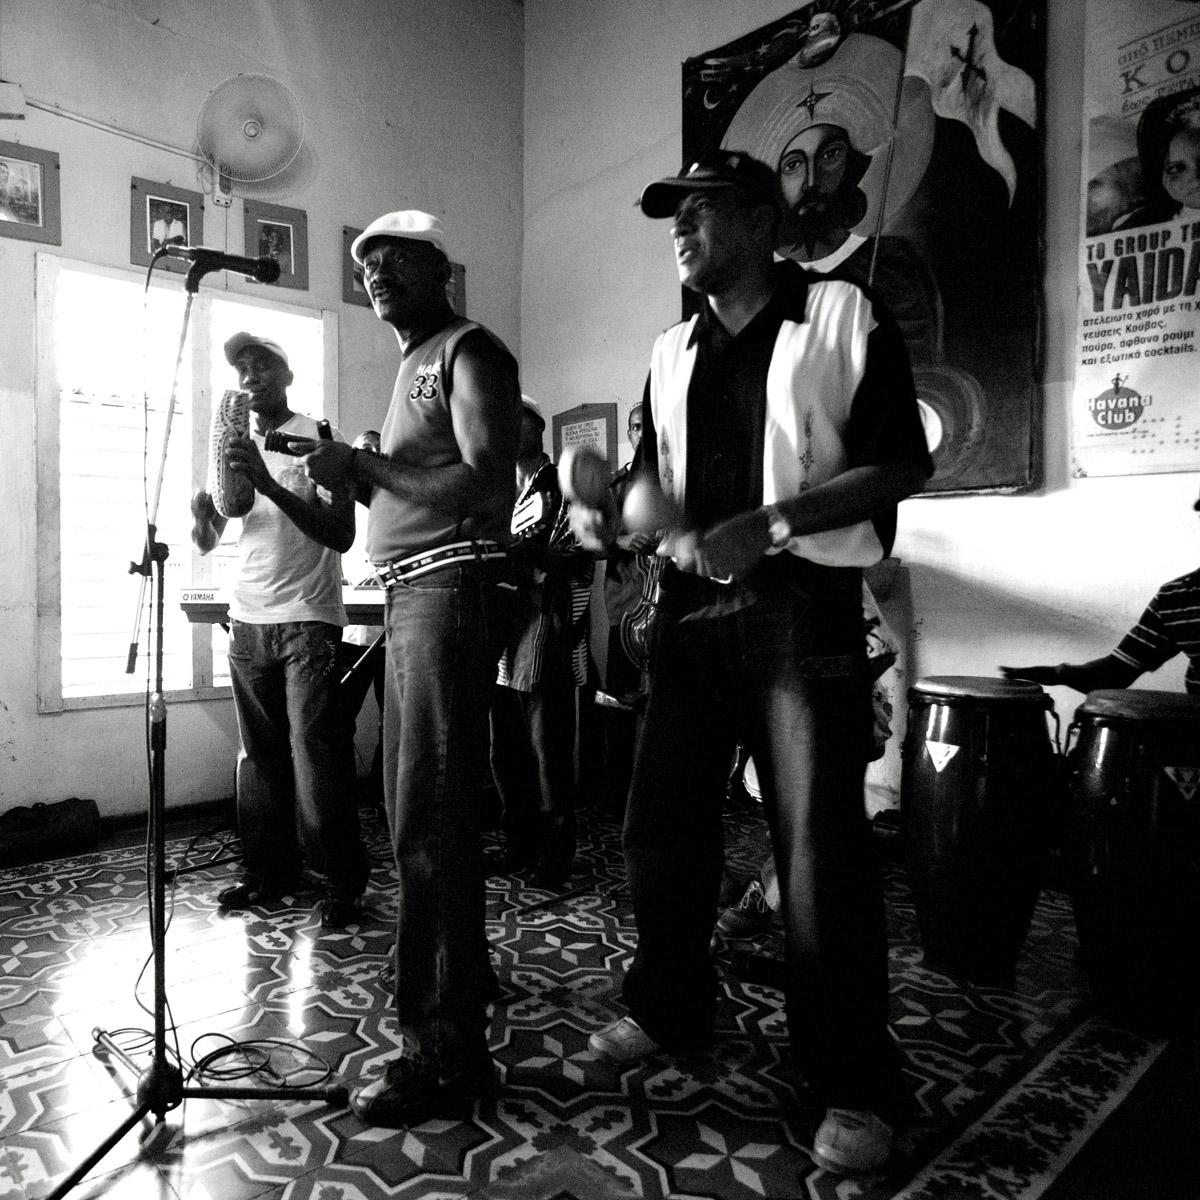 CUBAN HOUSE BAND, Santiago de Cuba, Cuban Music, Cuba Live Cuban Music, Best photographs of Cuban people